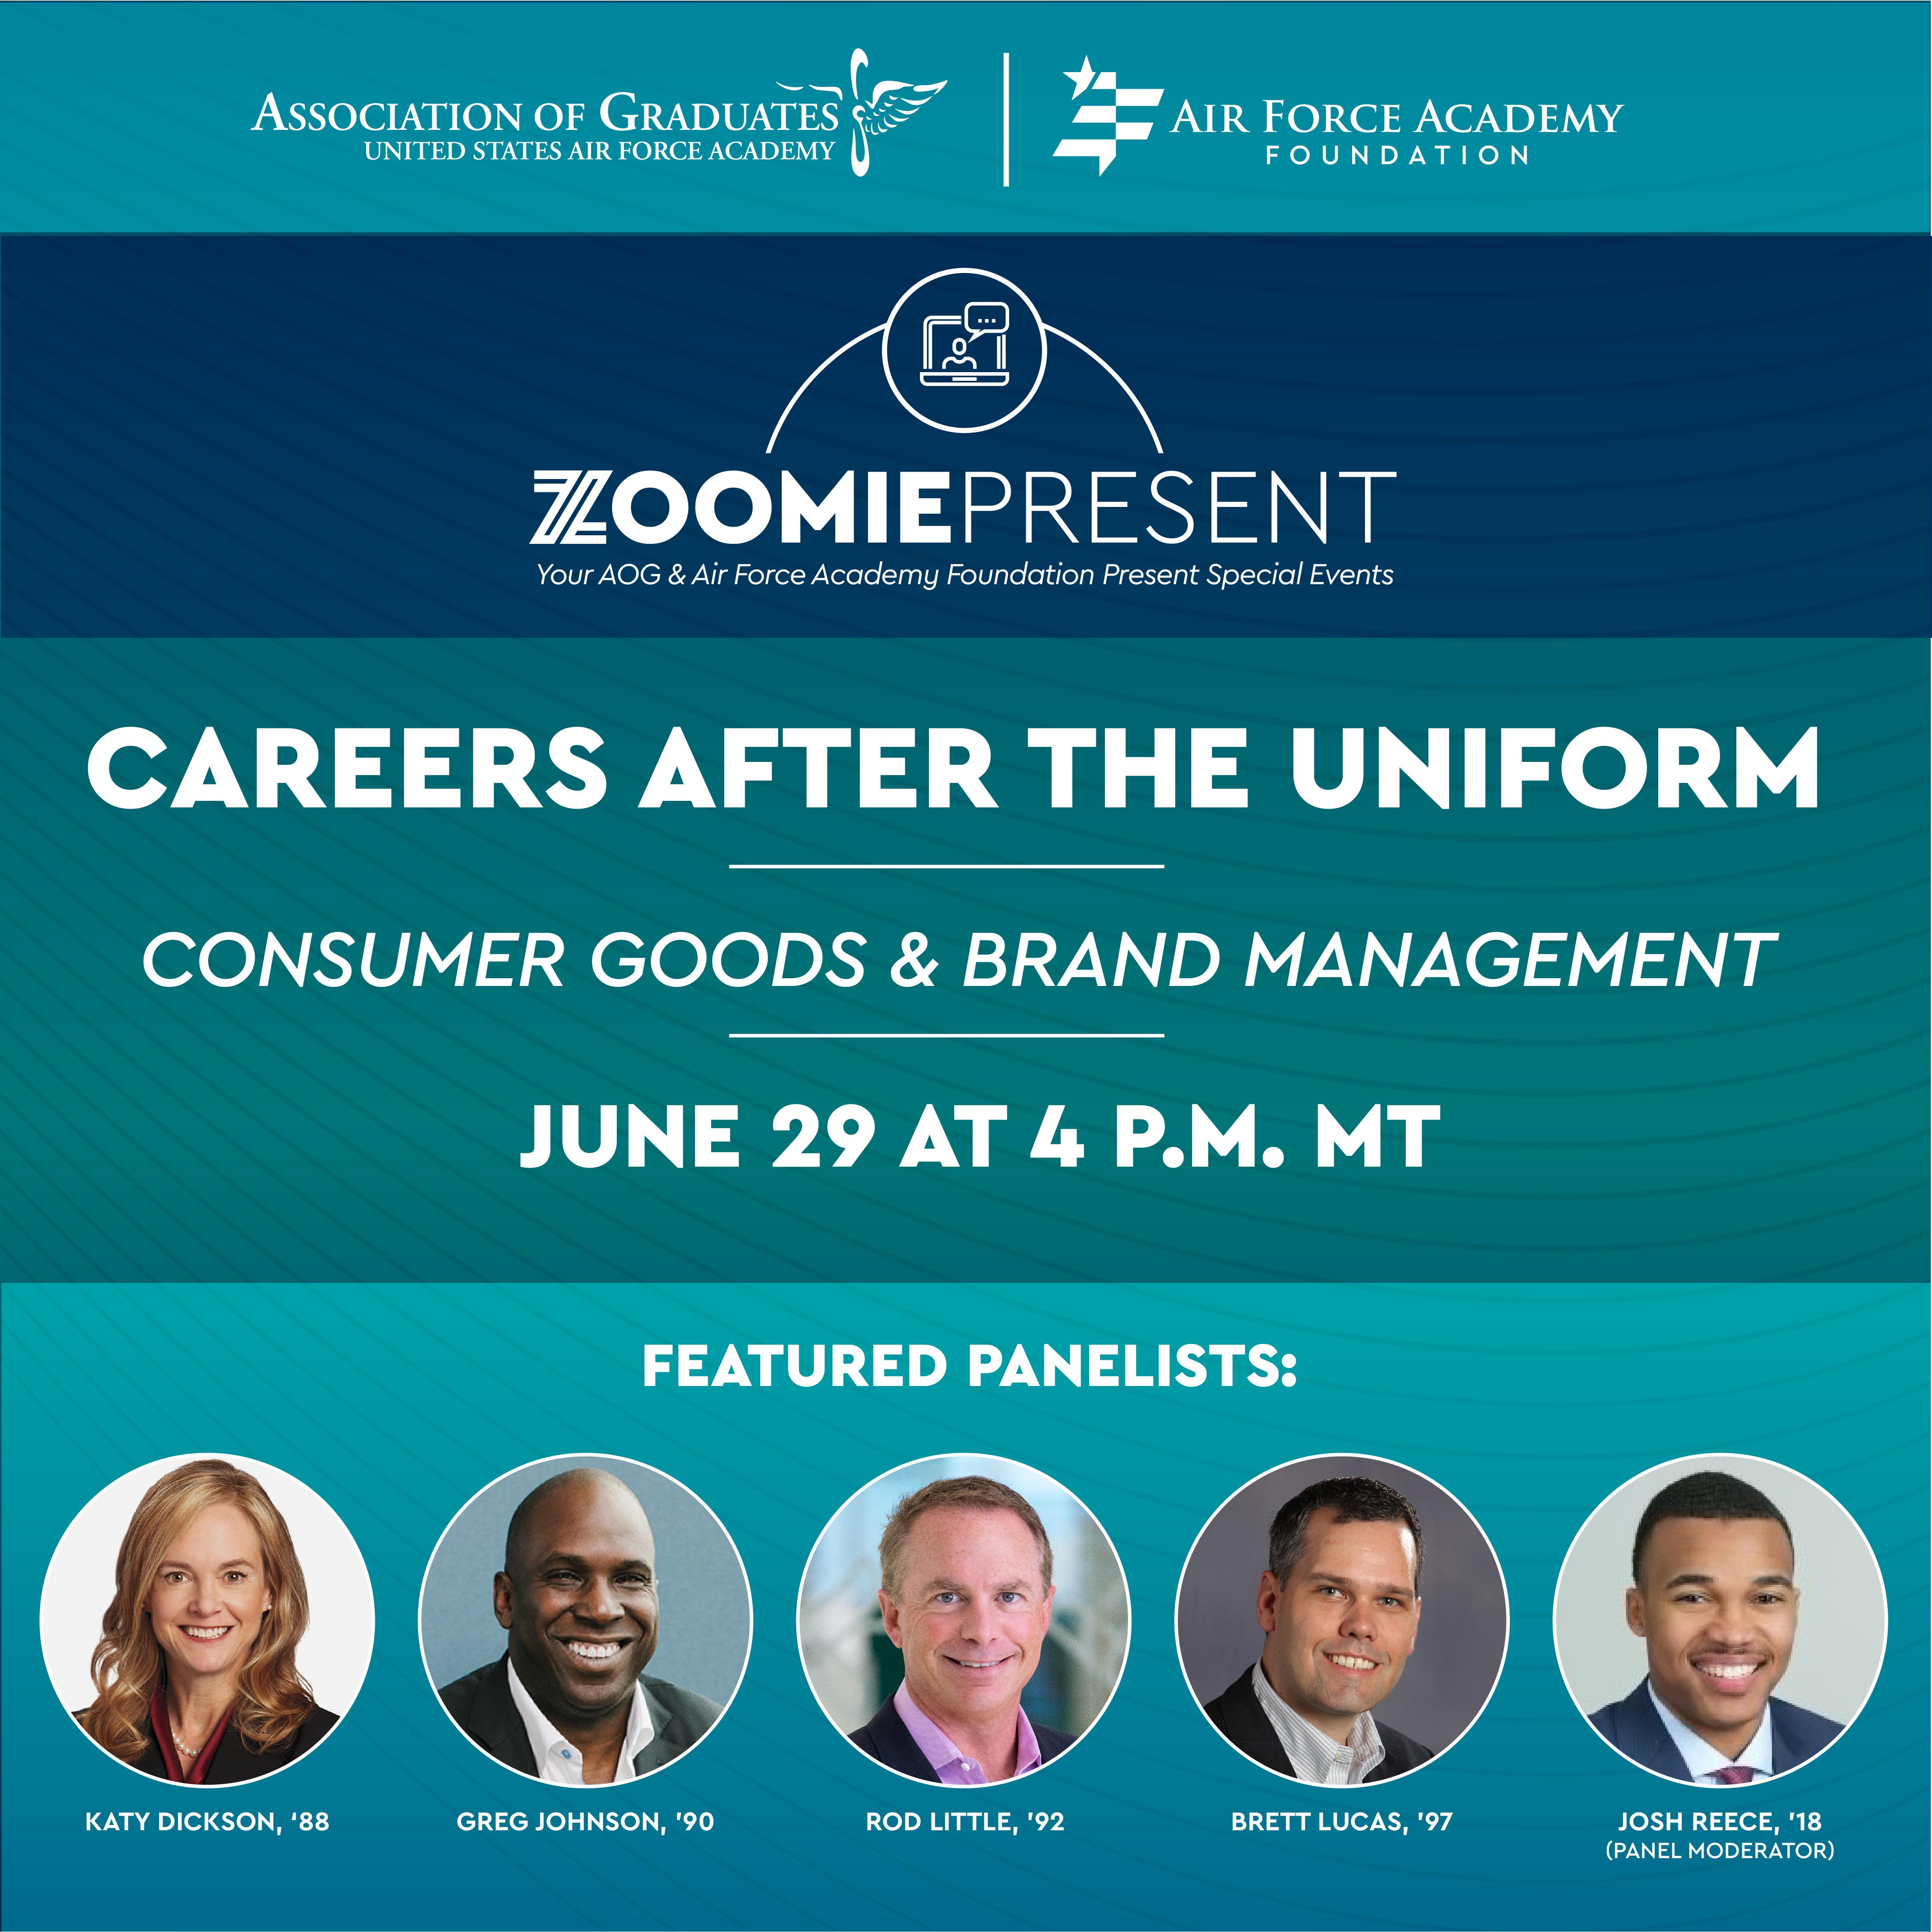 Image for Careers After the Uniform | Consumer Goods & Brand Management webinar